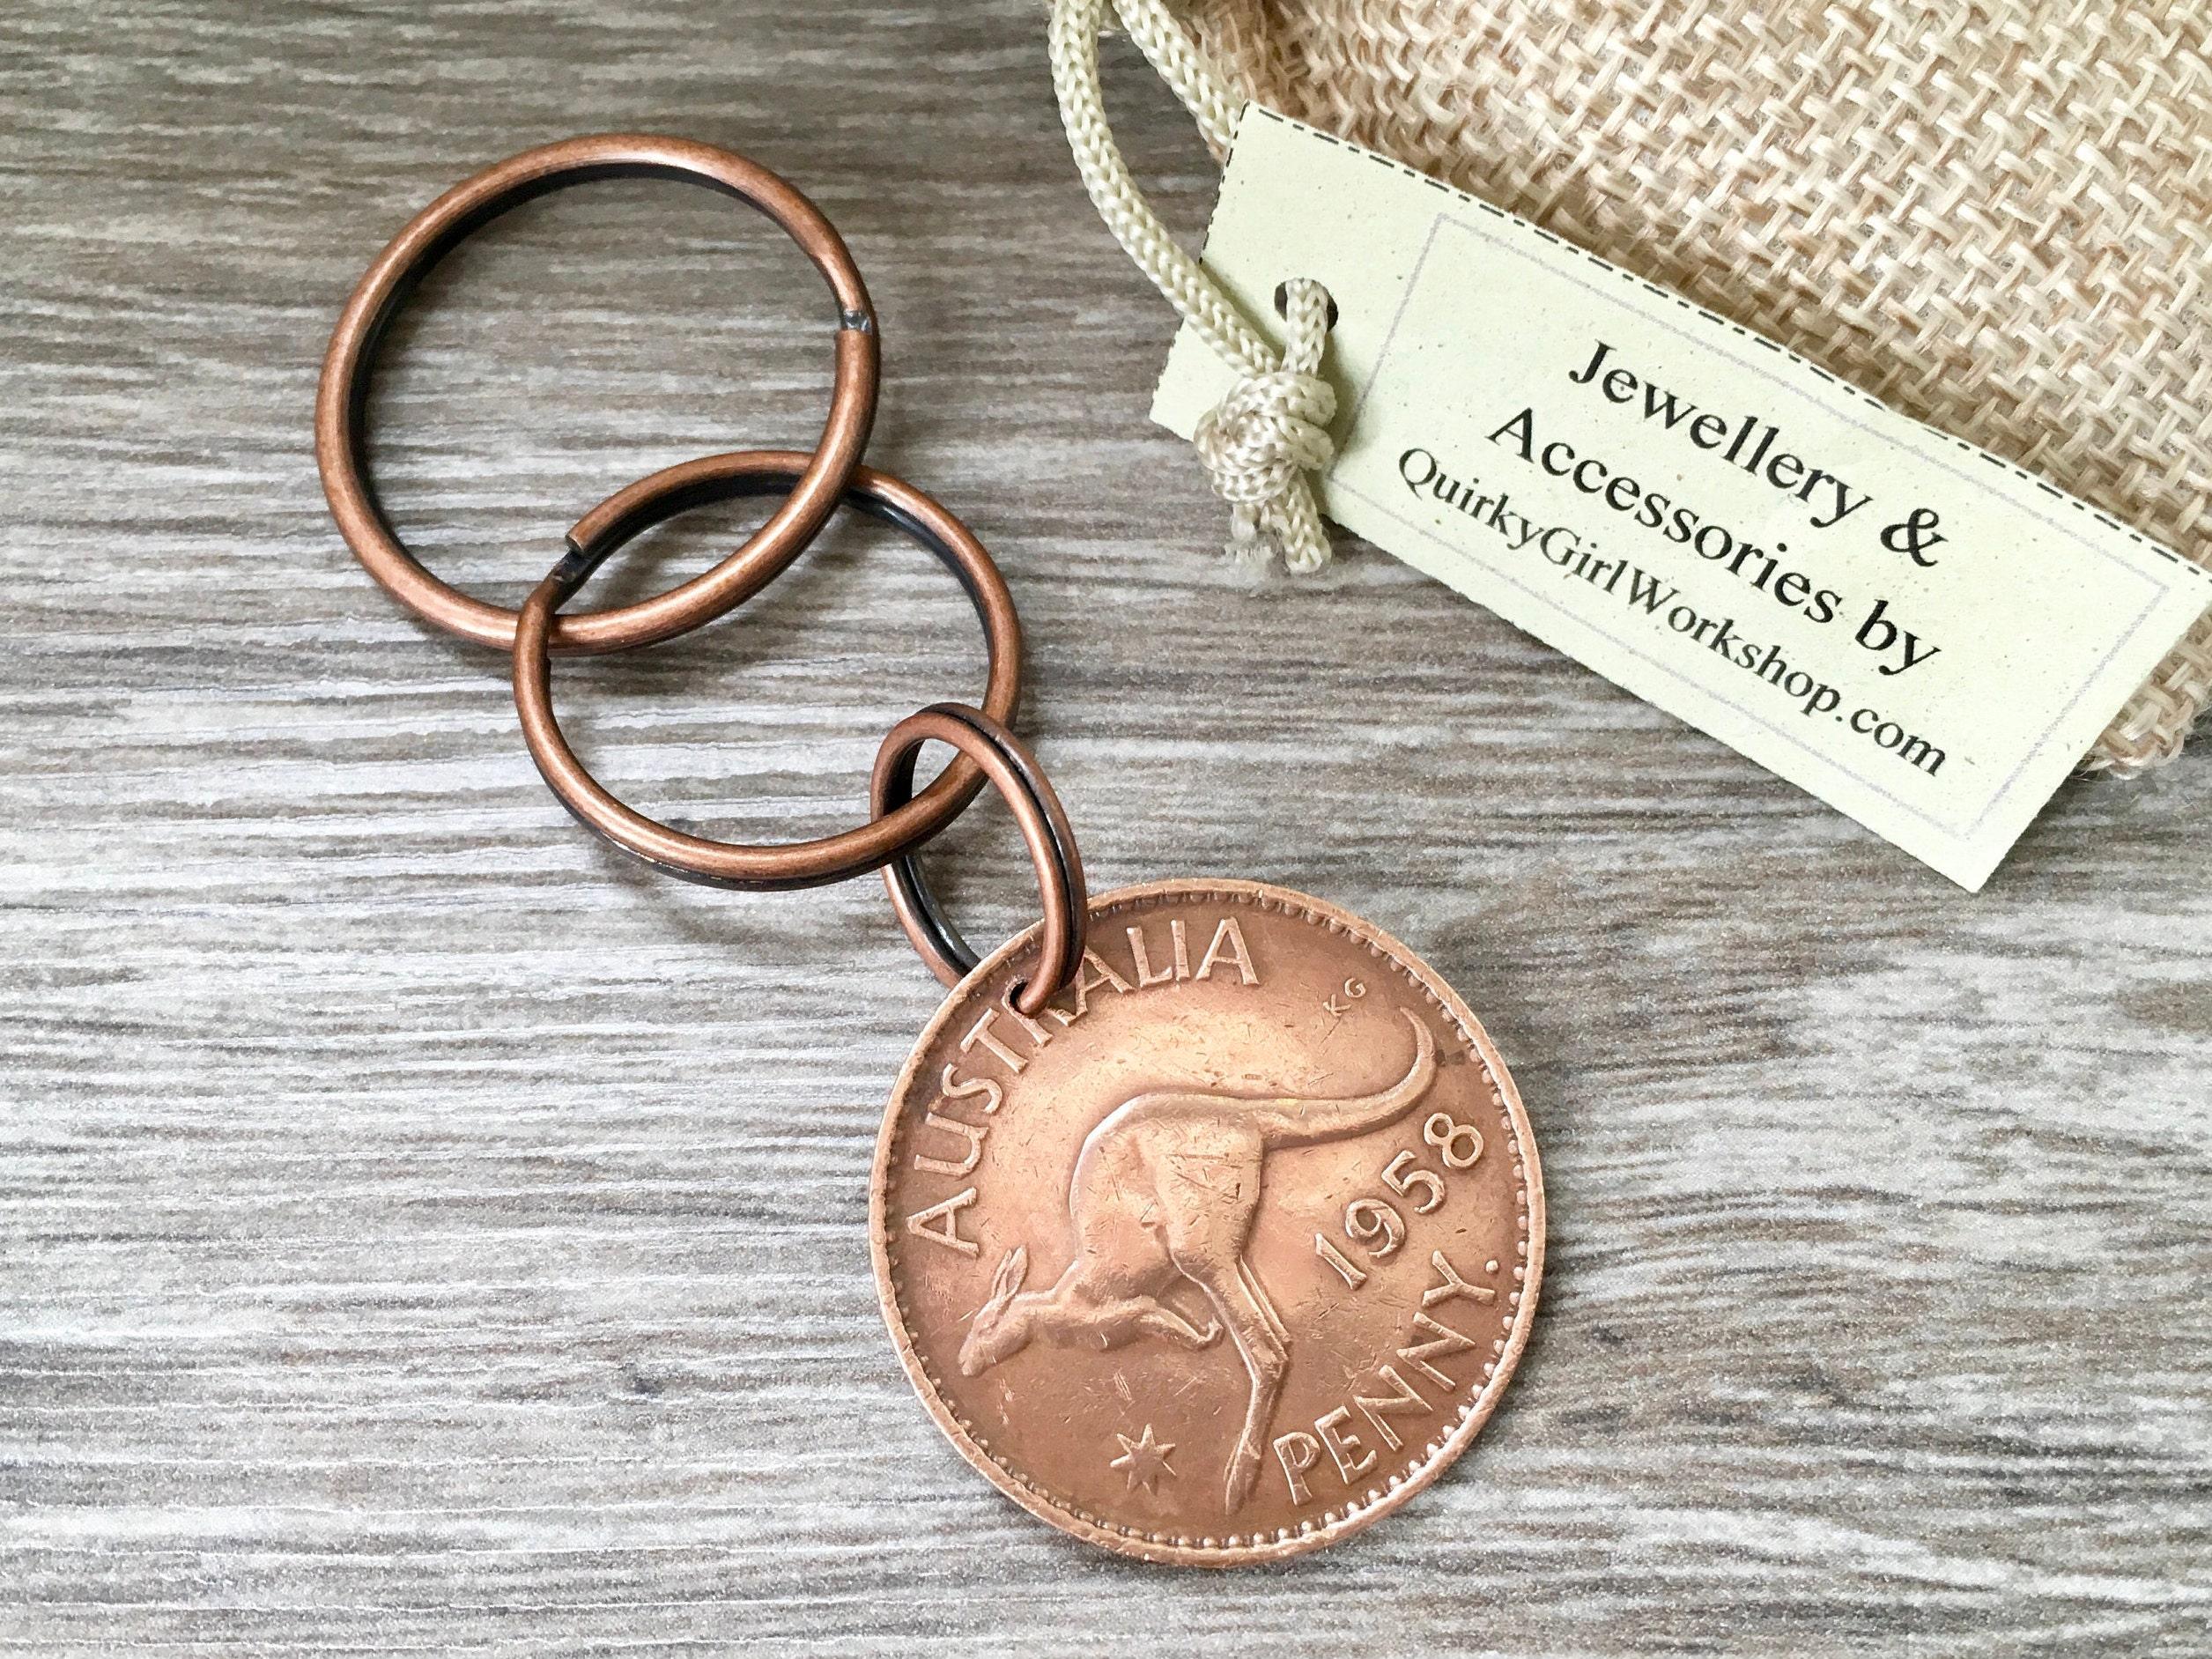 1958 Australian Kangaroo Coin Key Chain 60th Birthday Gift Australia Keyring Aussie Big Penny Clip Present Man Woman Men